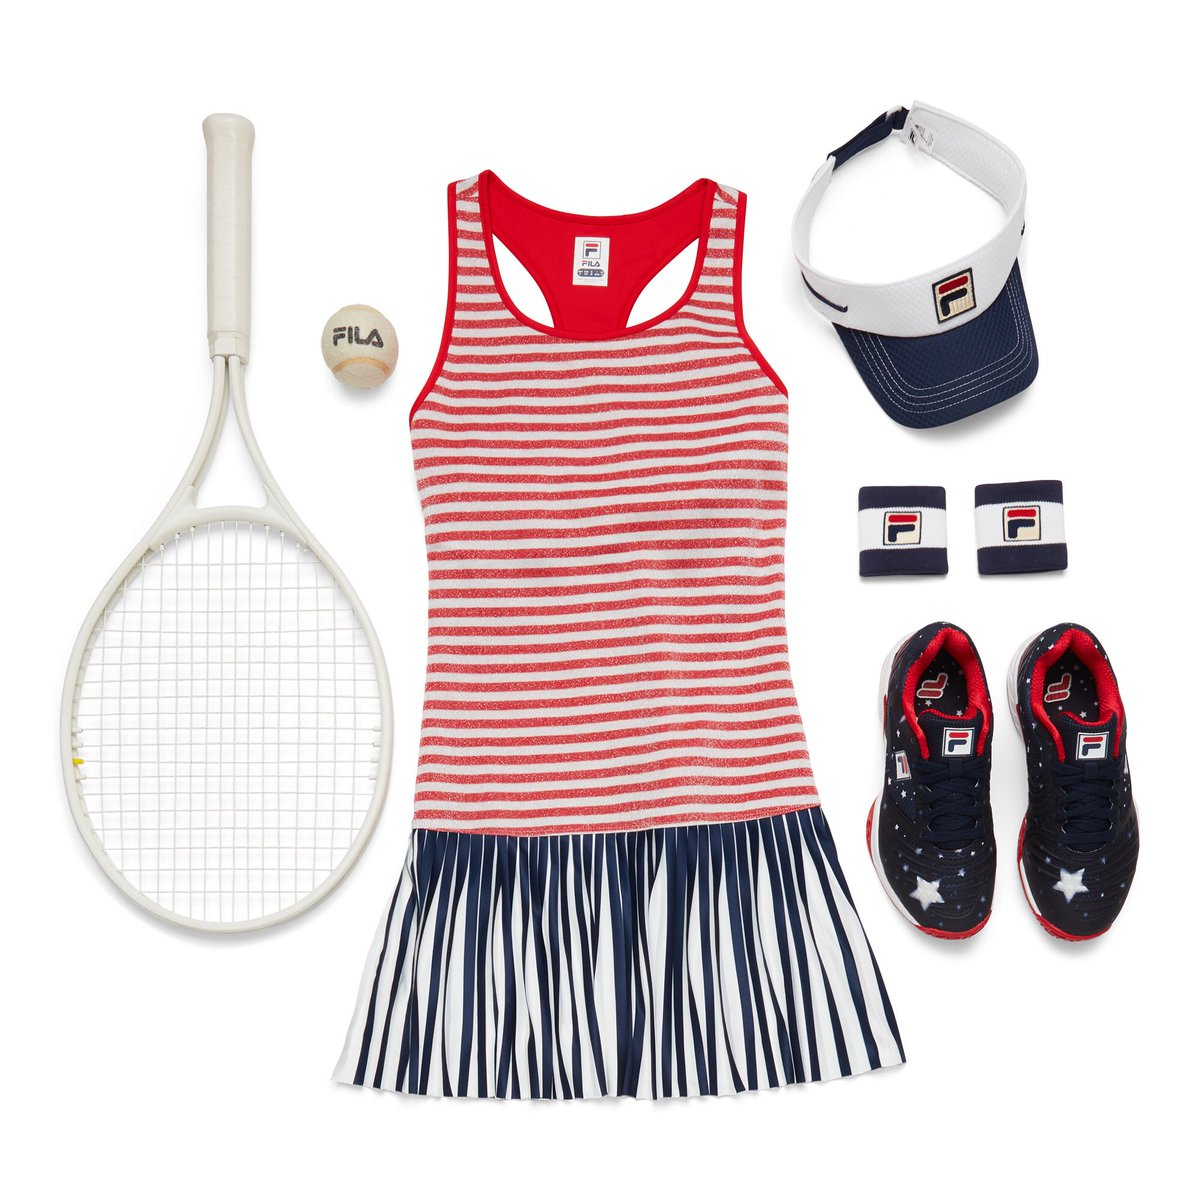 Fila Tennis On Twitter The Women S Heritage And Men S Legends